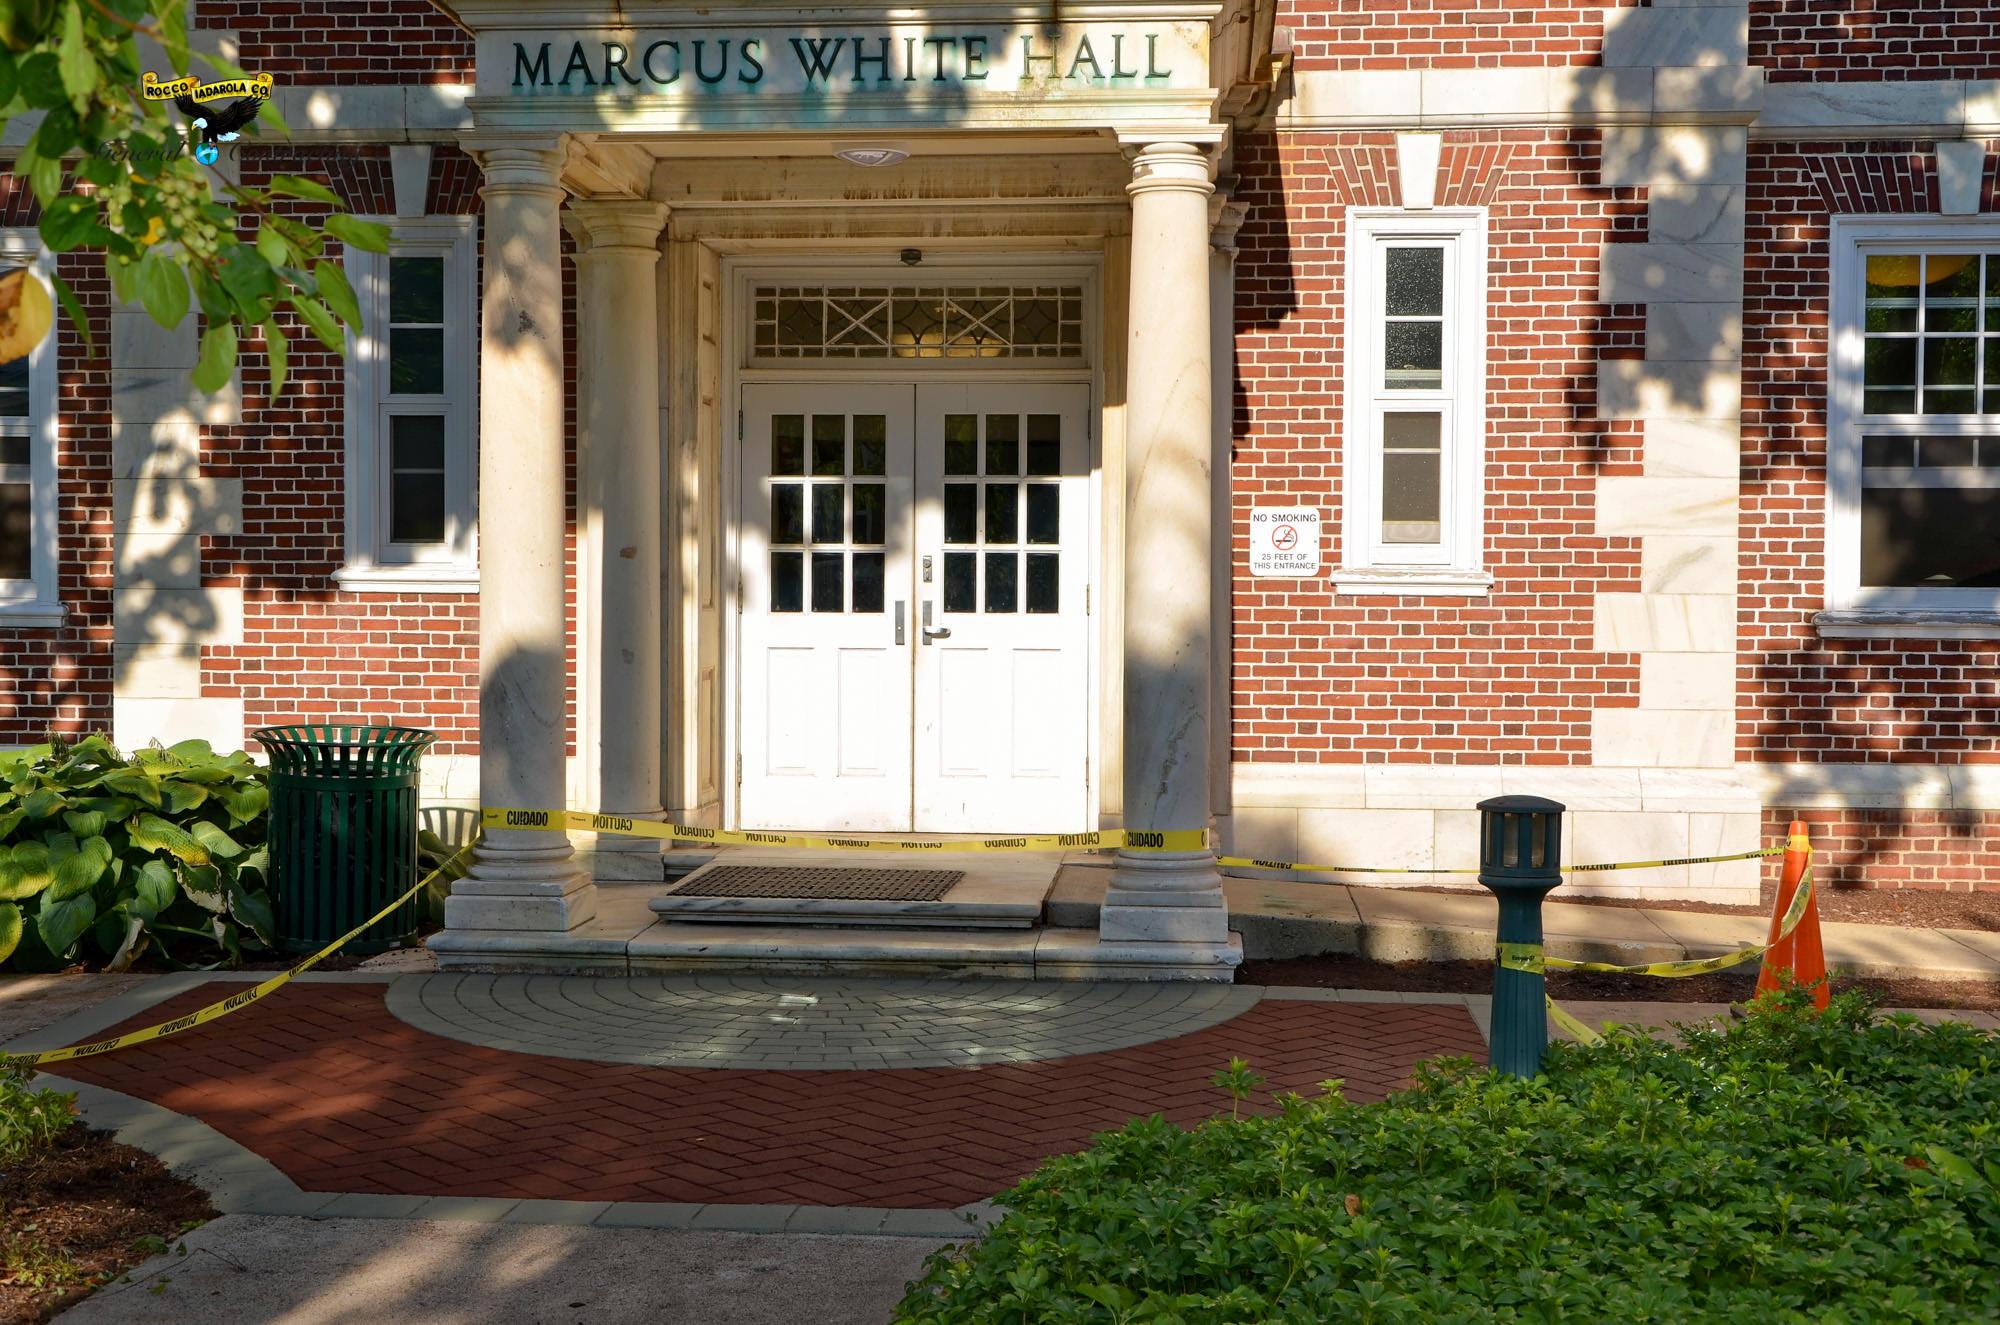 Marcus White Hall CCSU Central Connecticut State University Rocco Iadarola Asphalting-108.jpg